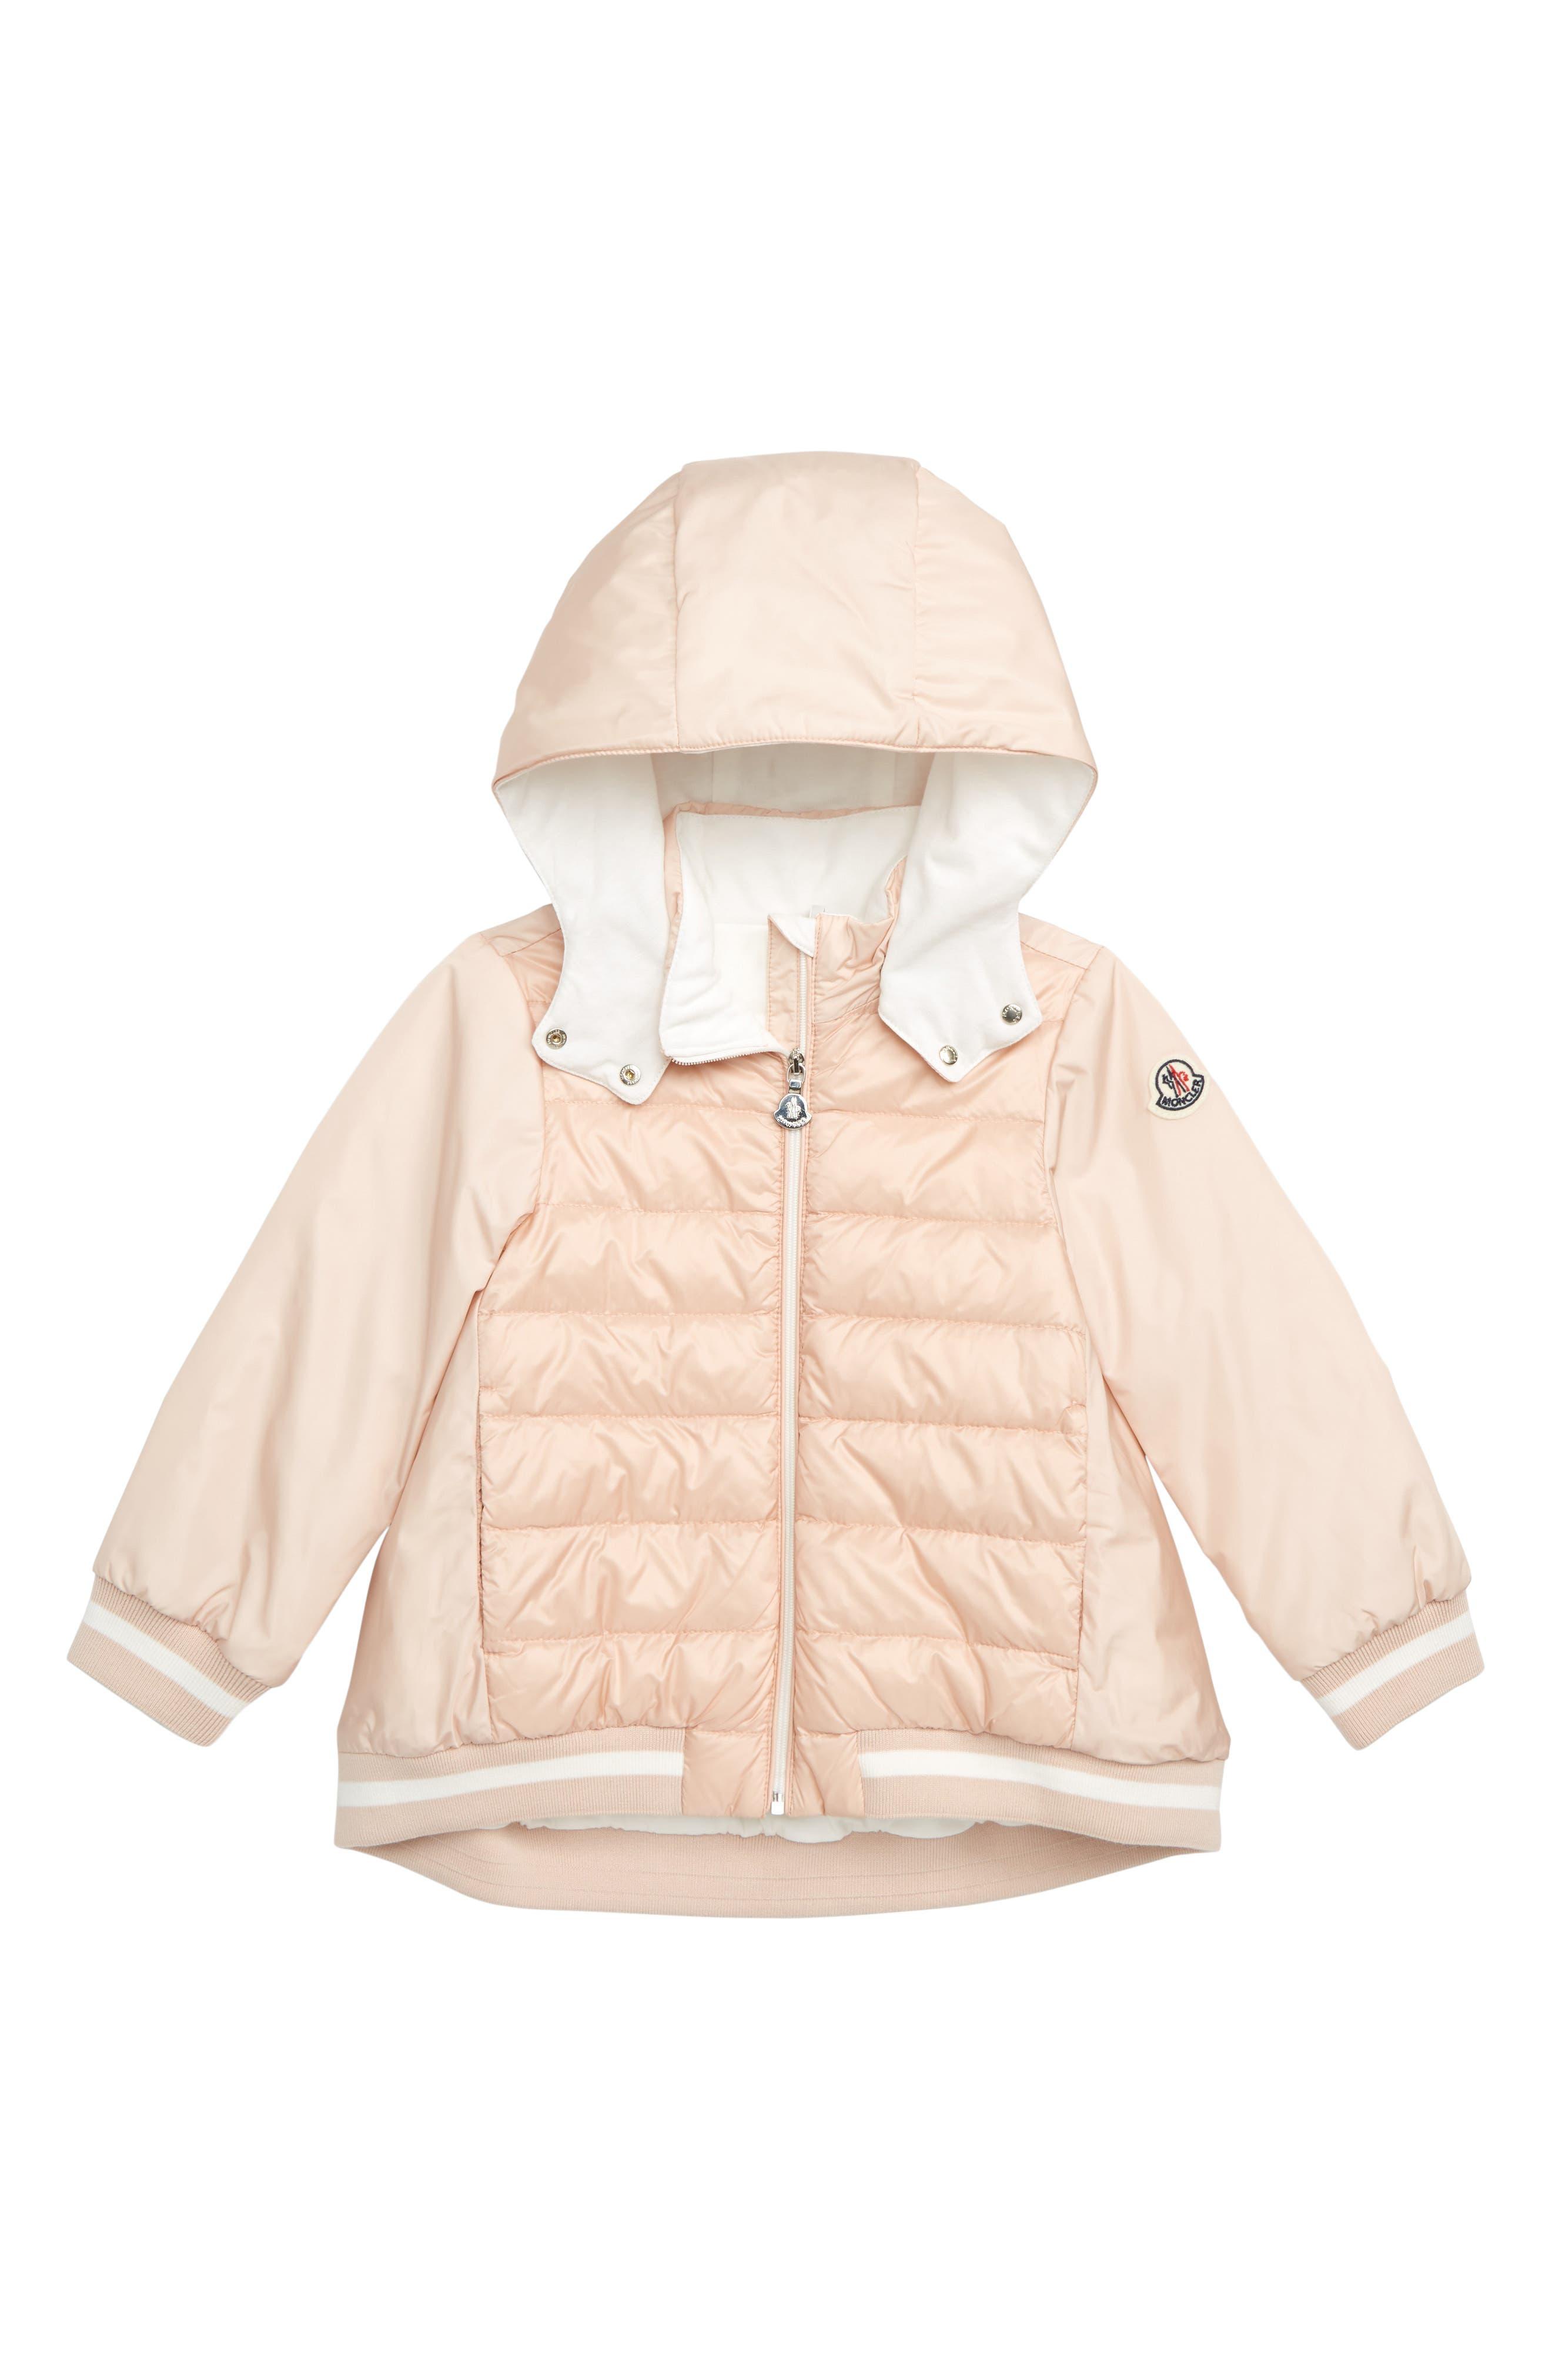 MONCLER Tureia Hooded Down Jacket, Main, color, 50B LT PINK